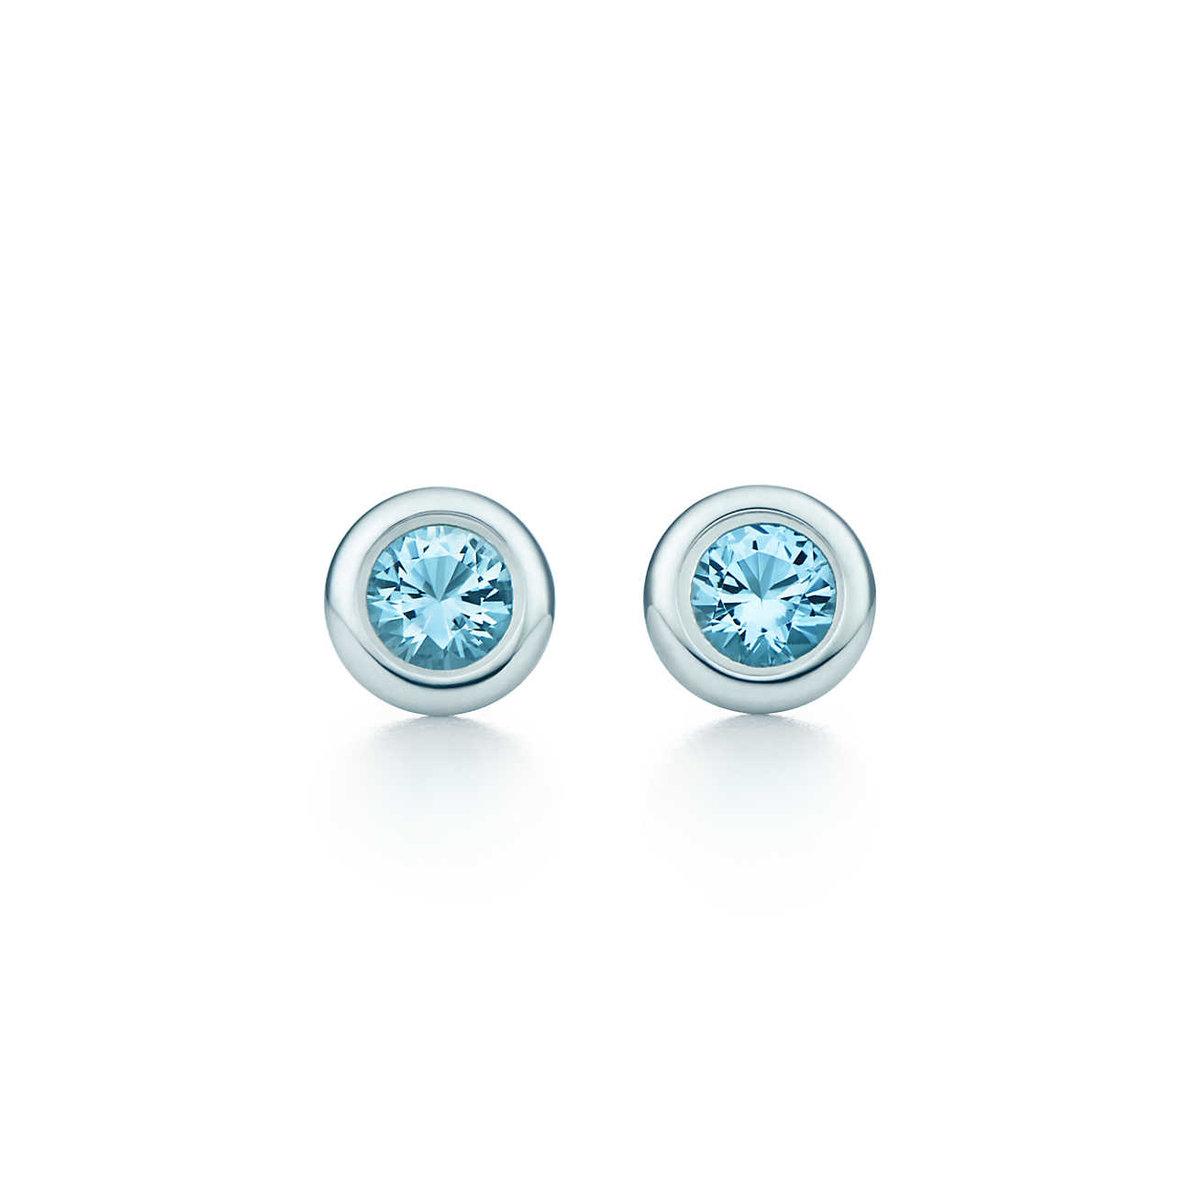 Серьги Elsa Peretti™ Color by the Yard из стерлингового серебра с аквамаринами.                    Tiffany & Co.